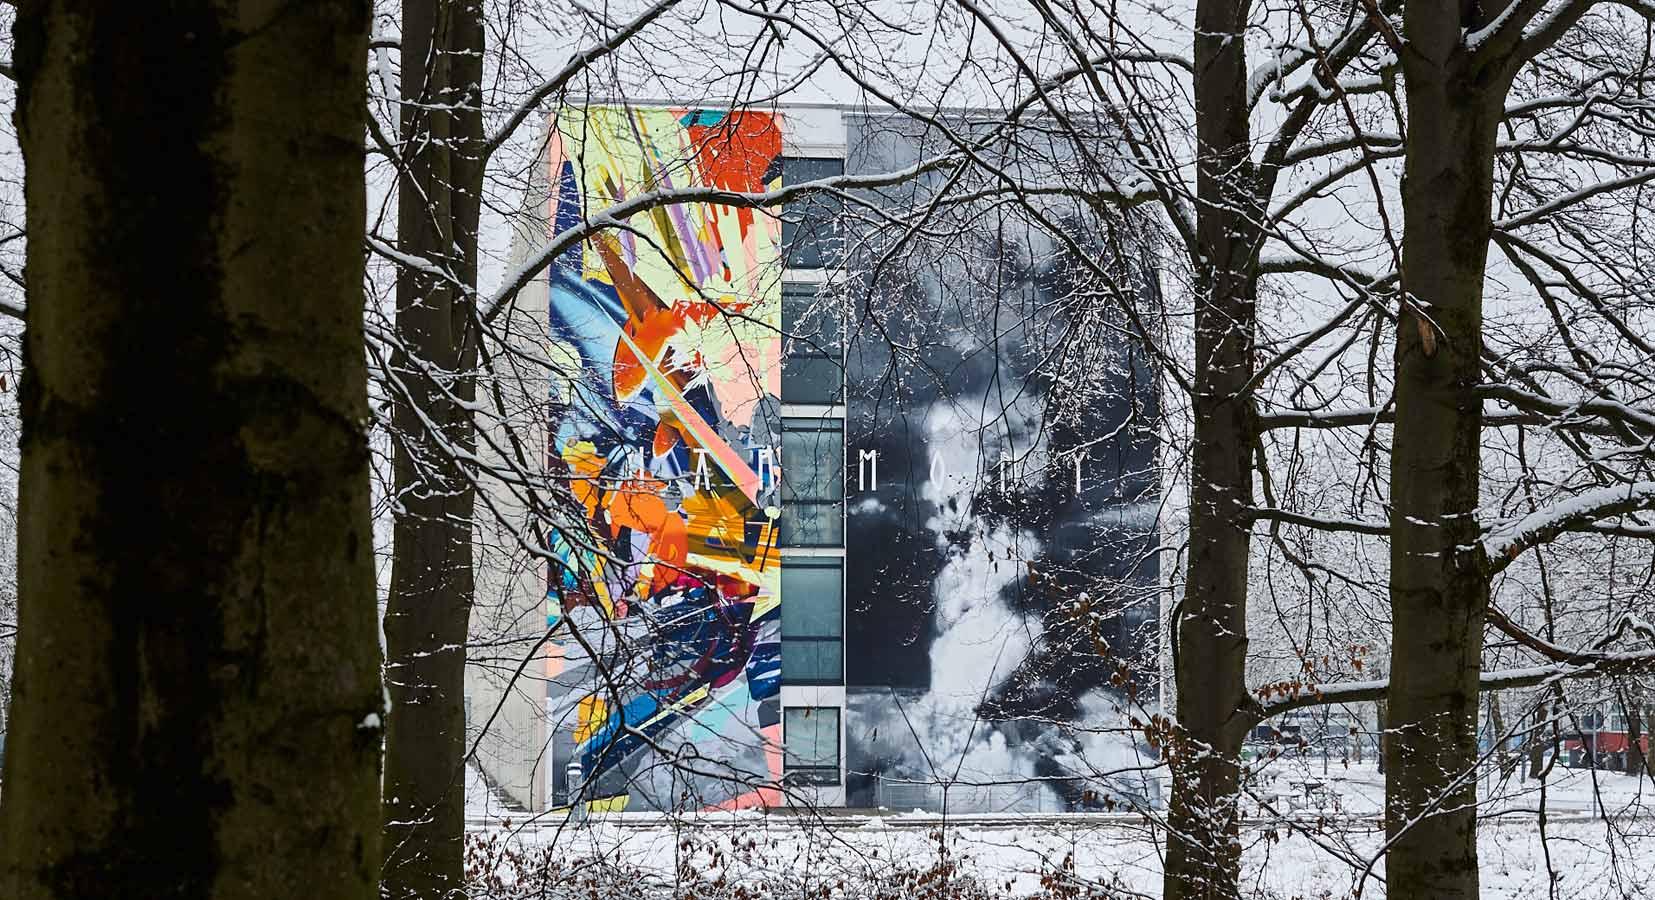 Scale-Street-Art-Siemens-Gelaende-Muenchen-2017--3